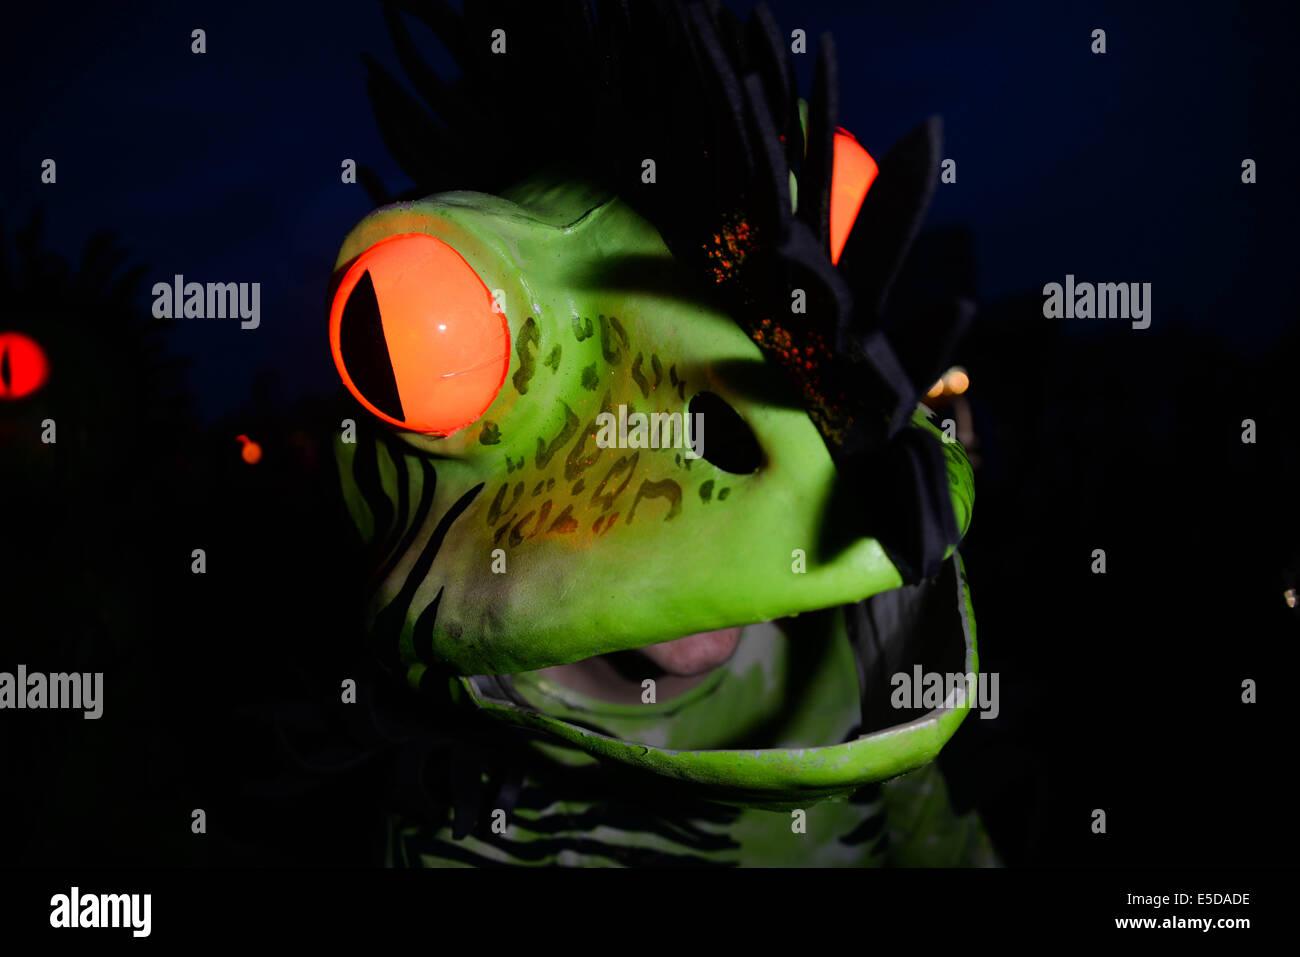 Fabio Allman Stock Photos & Fabio Allman Stock Images - Alamy